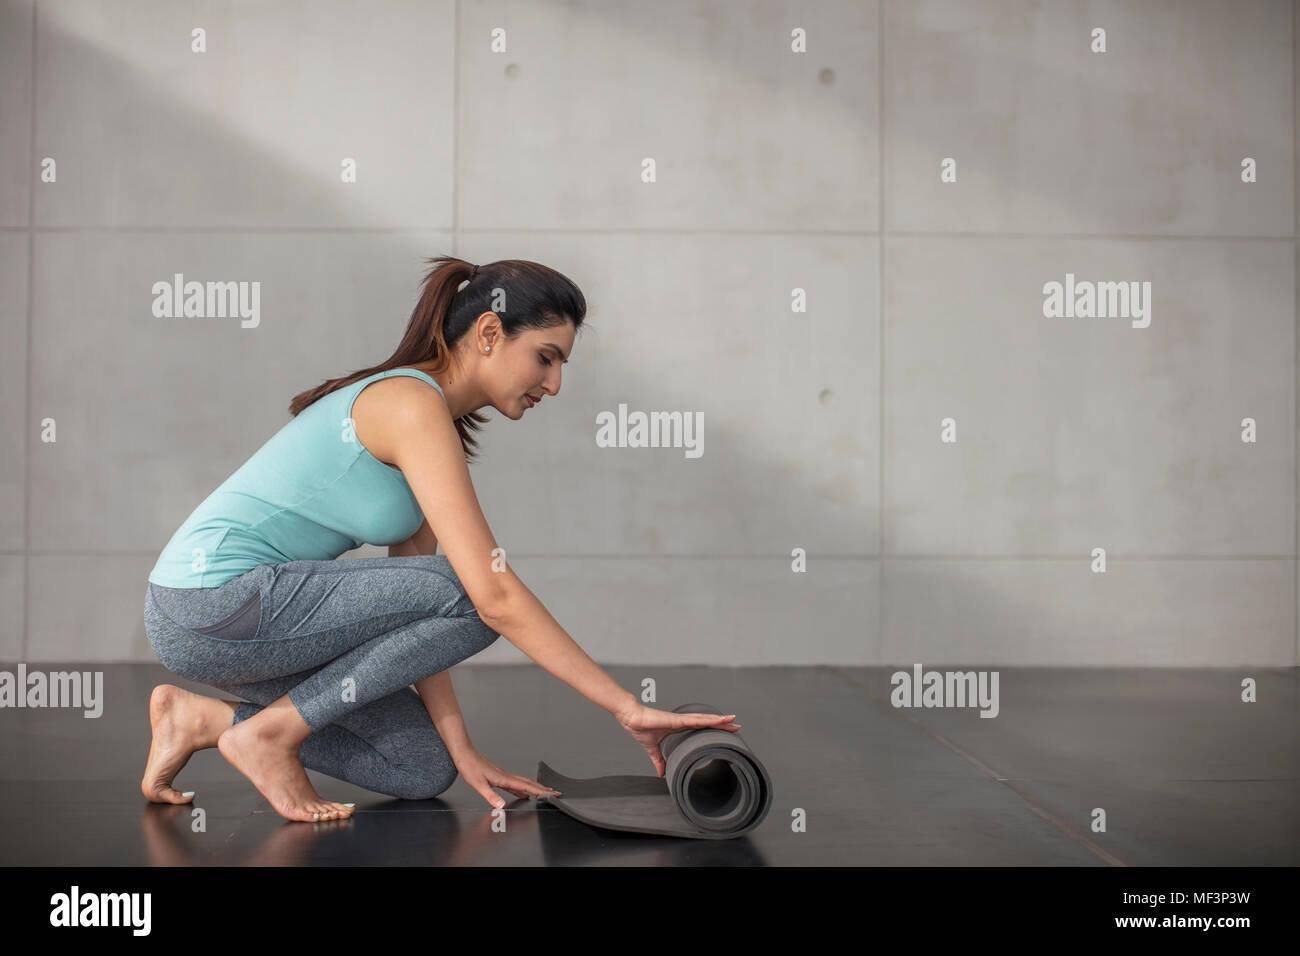 Junge Frau vorbereiten für Yoga Übung im Studio Stockbild